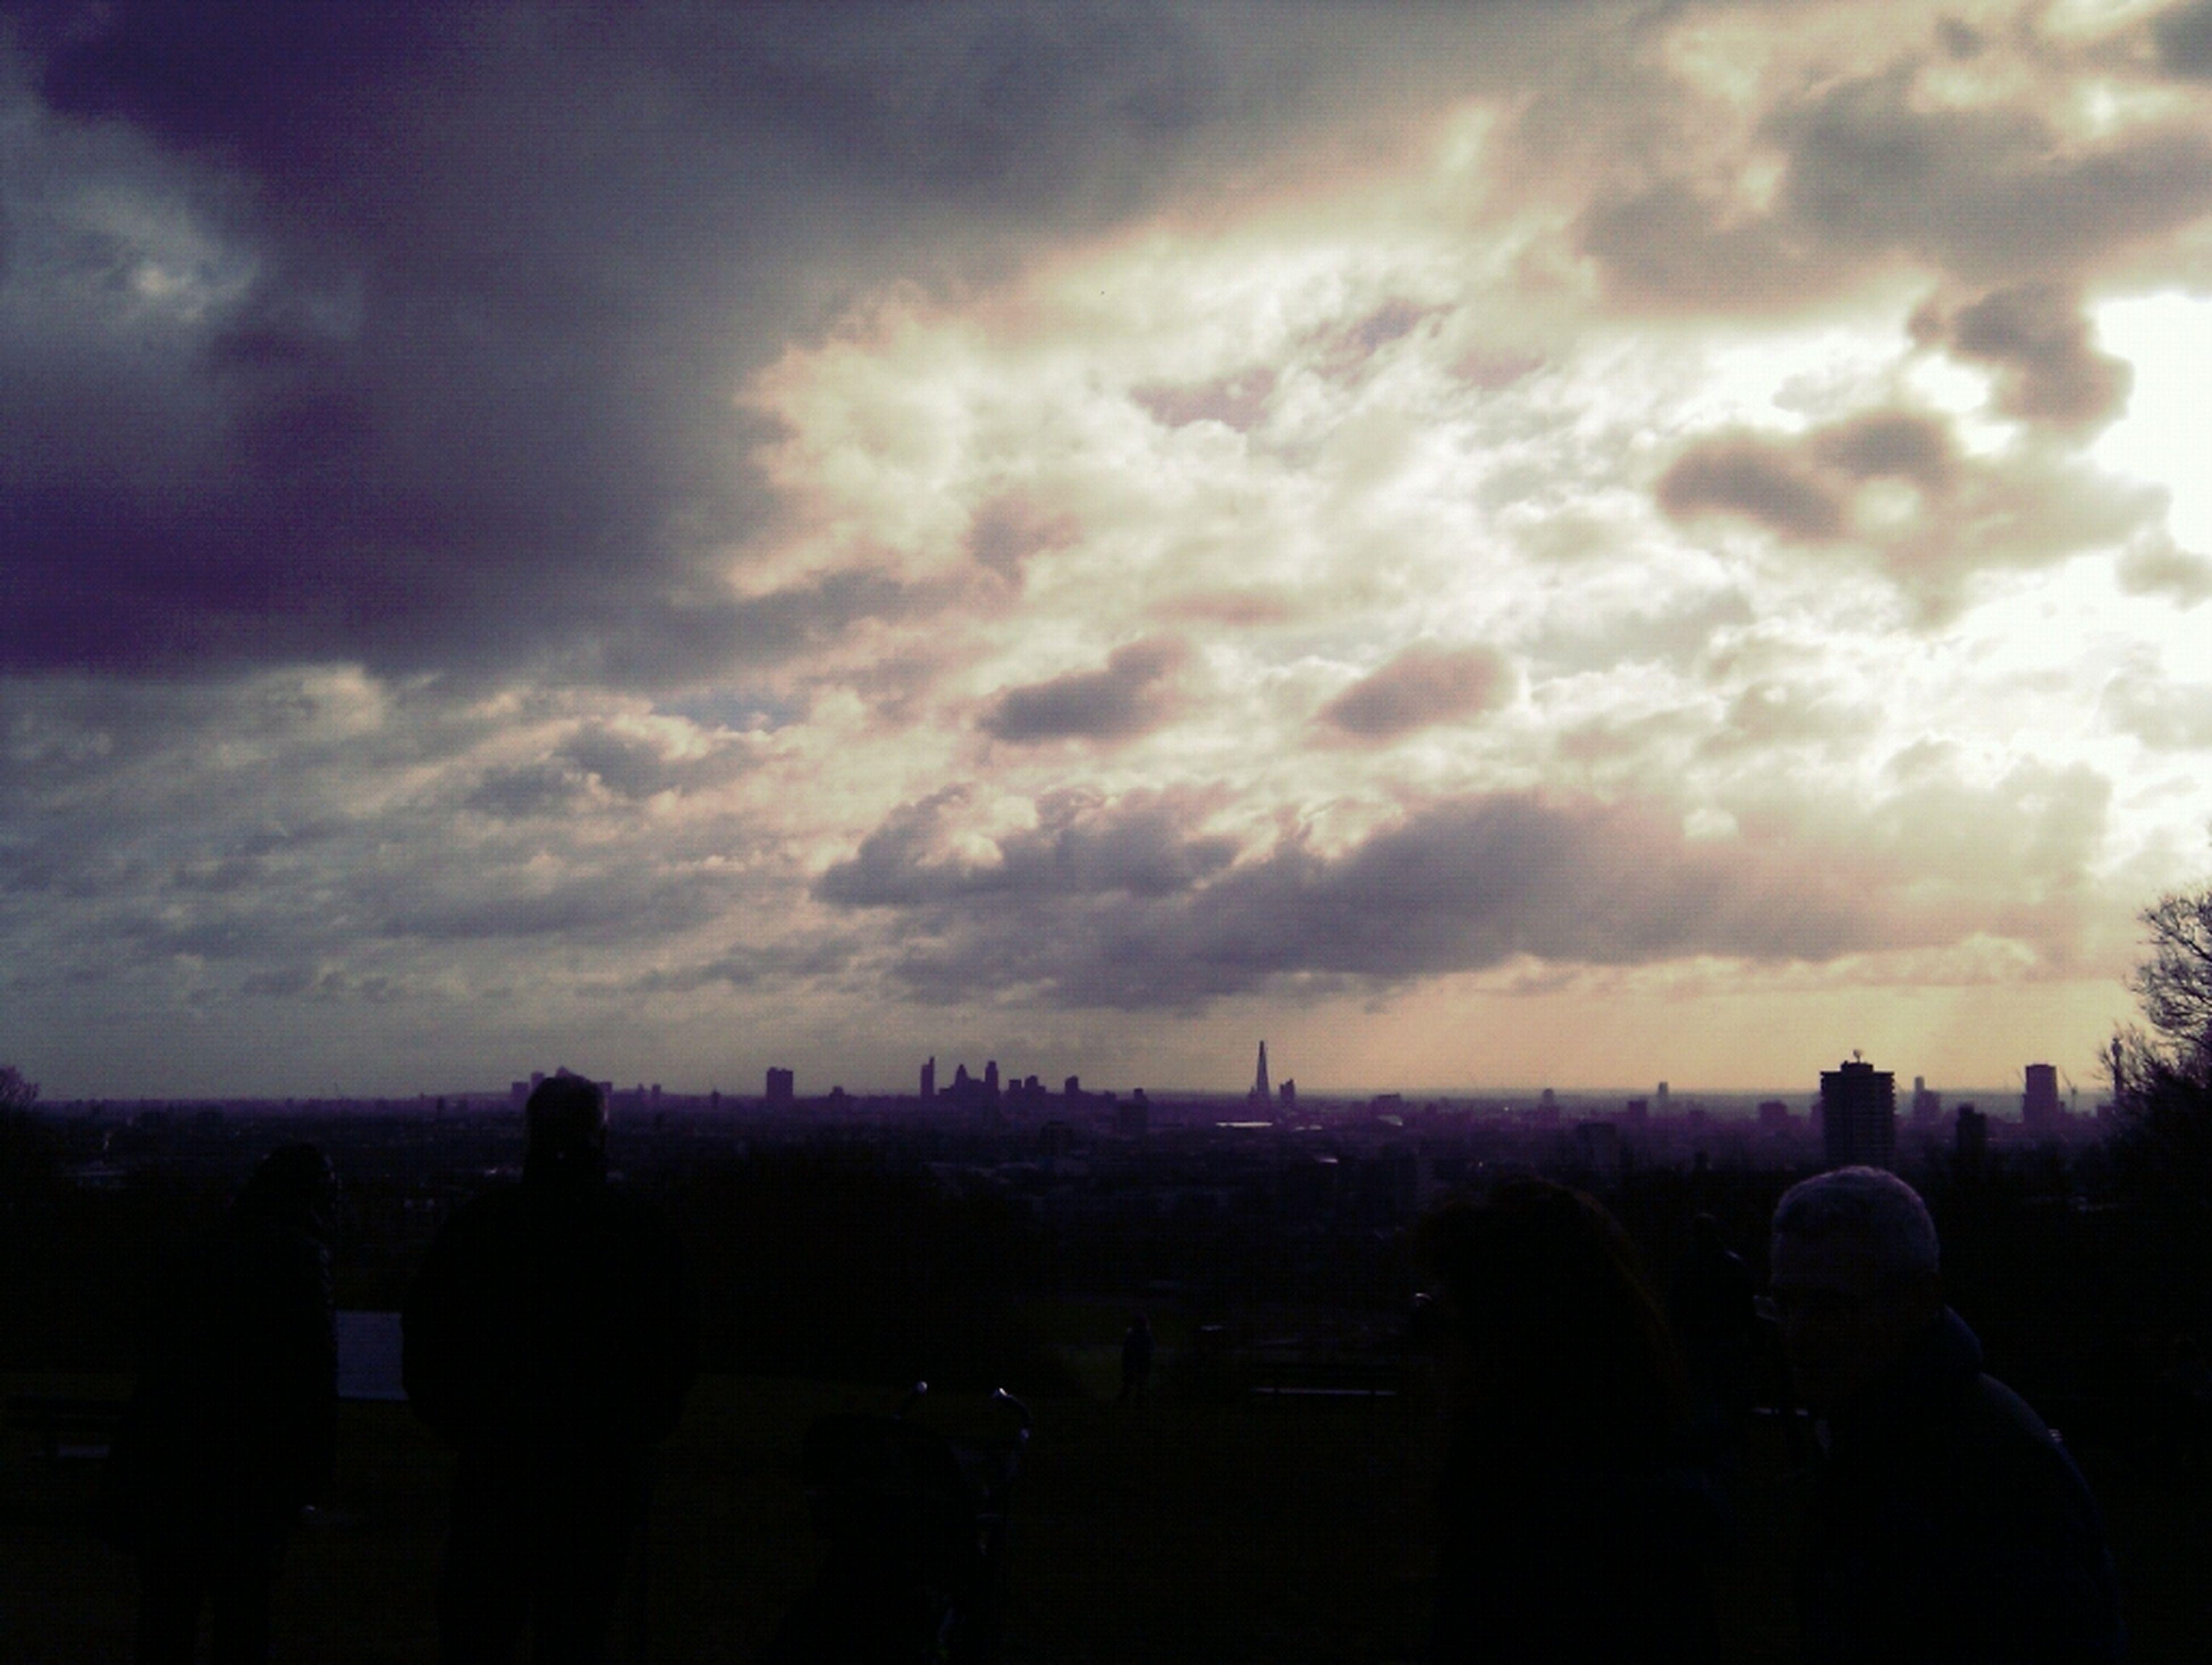 sky, cloud - sky, silhouette, men, cloudy, building exterior, built structure, lifestyles, architecture, city, leisure activity, person, dusk, cloud, weather, sunset, large group of people, cityscape, overcast